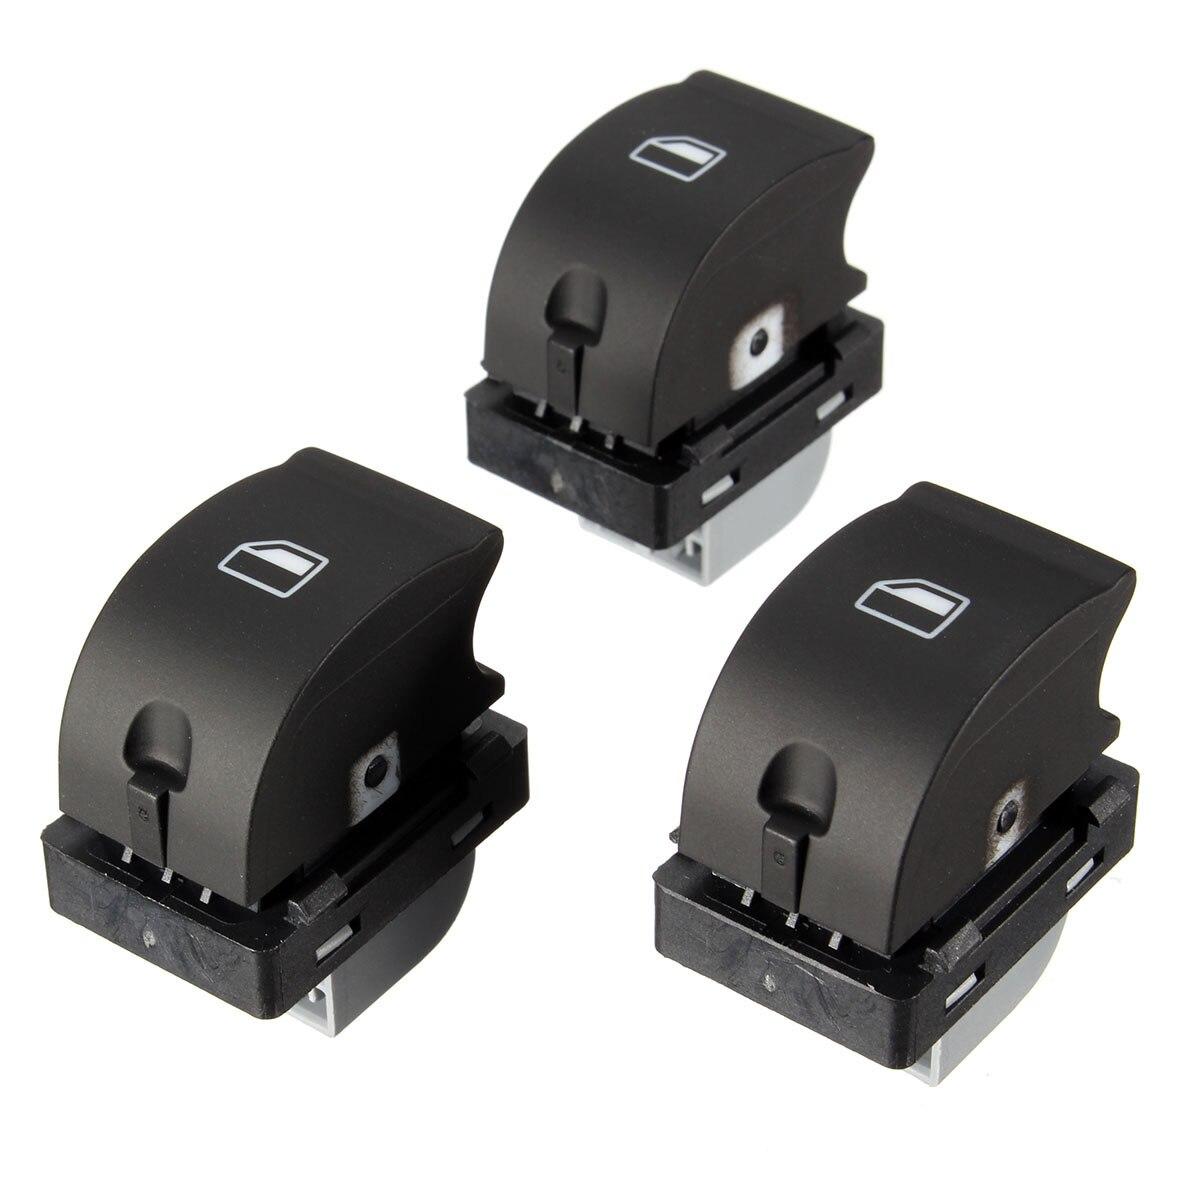 3pcs Car Passenger Window Switch for Audi A4 S4 B6 B7 8E0 959 855 / 8E0959855 Replacement Window Lift Control Button Switches